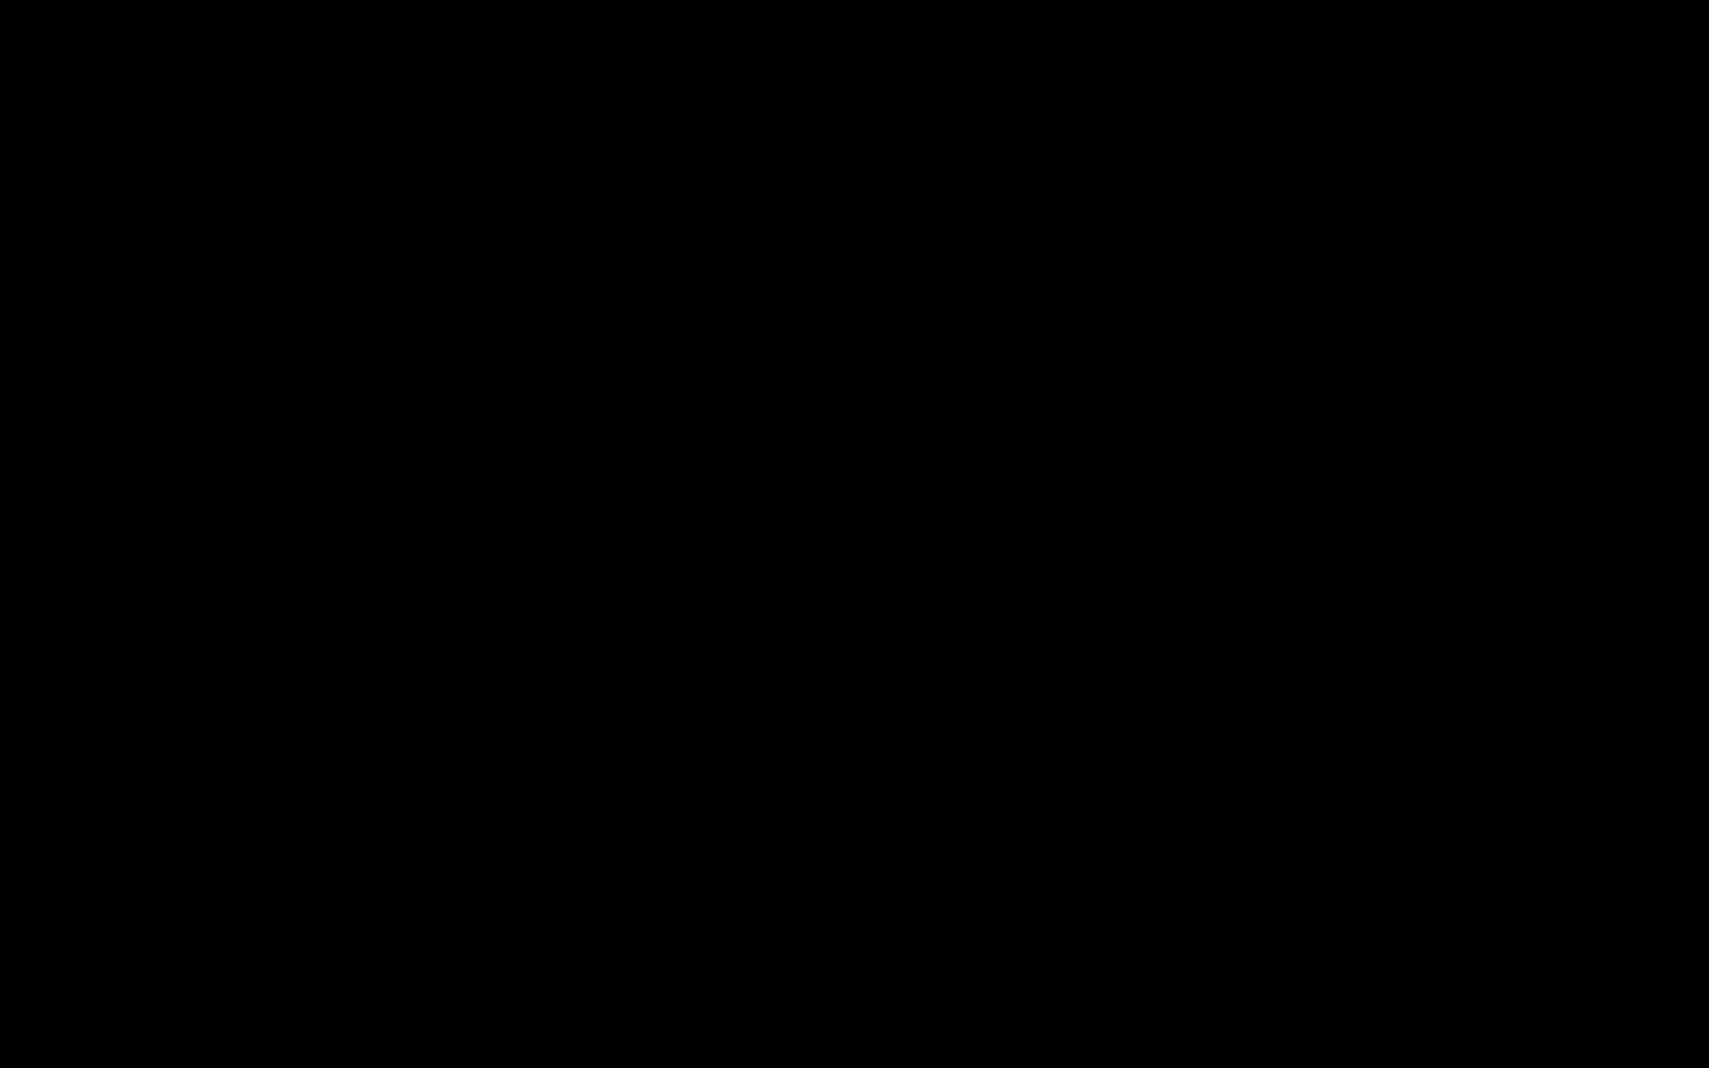 overlay-transparent-gradient.png